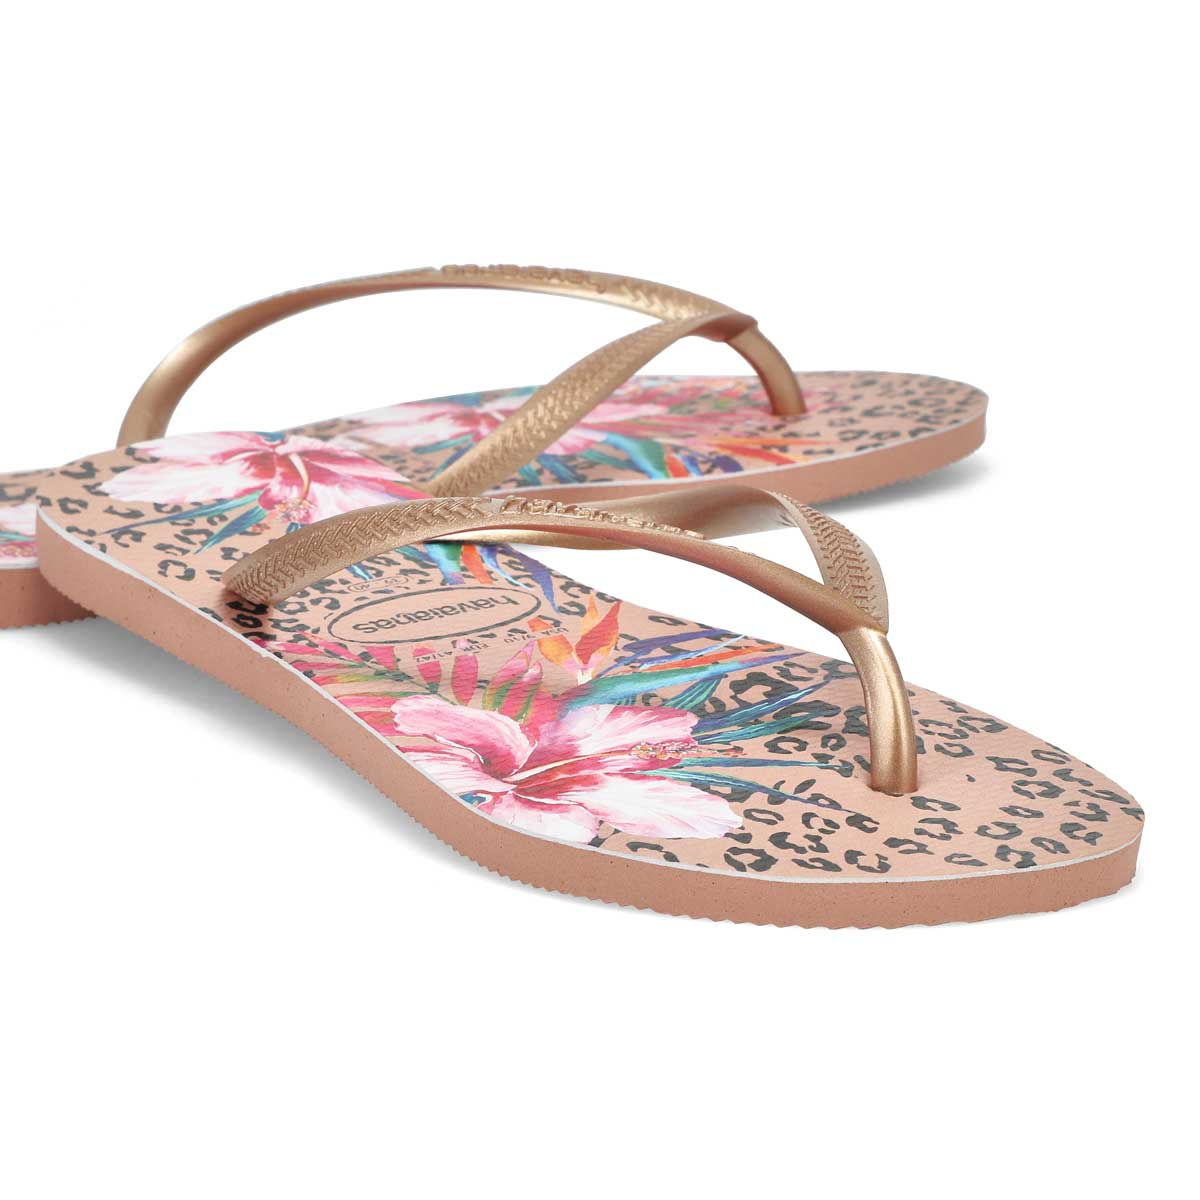 Women's Slim Animal Floral Flip Flop - Crocus